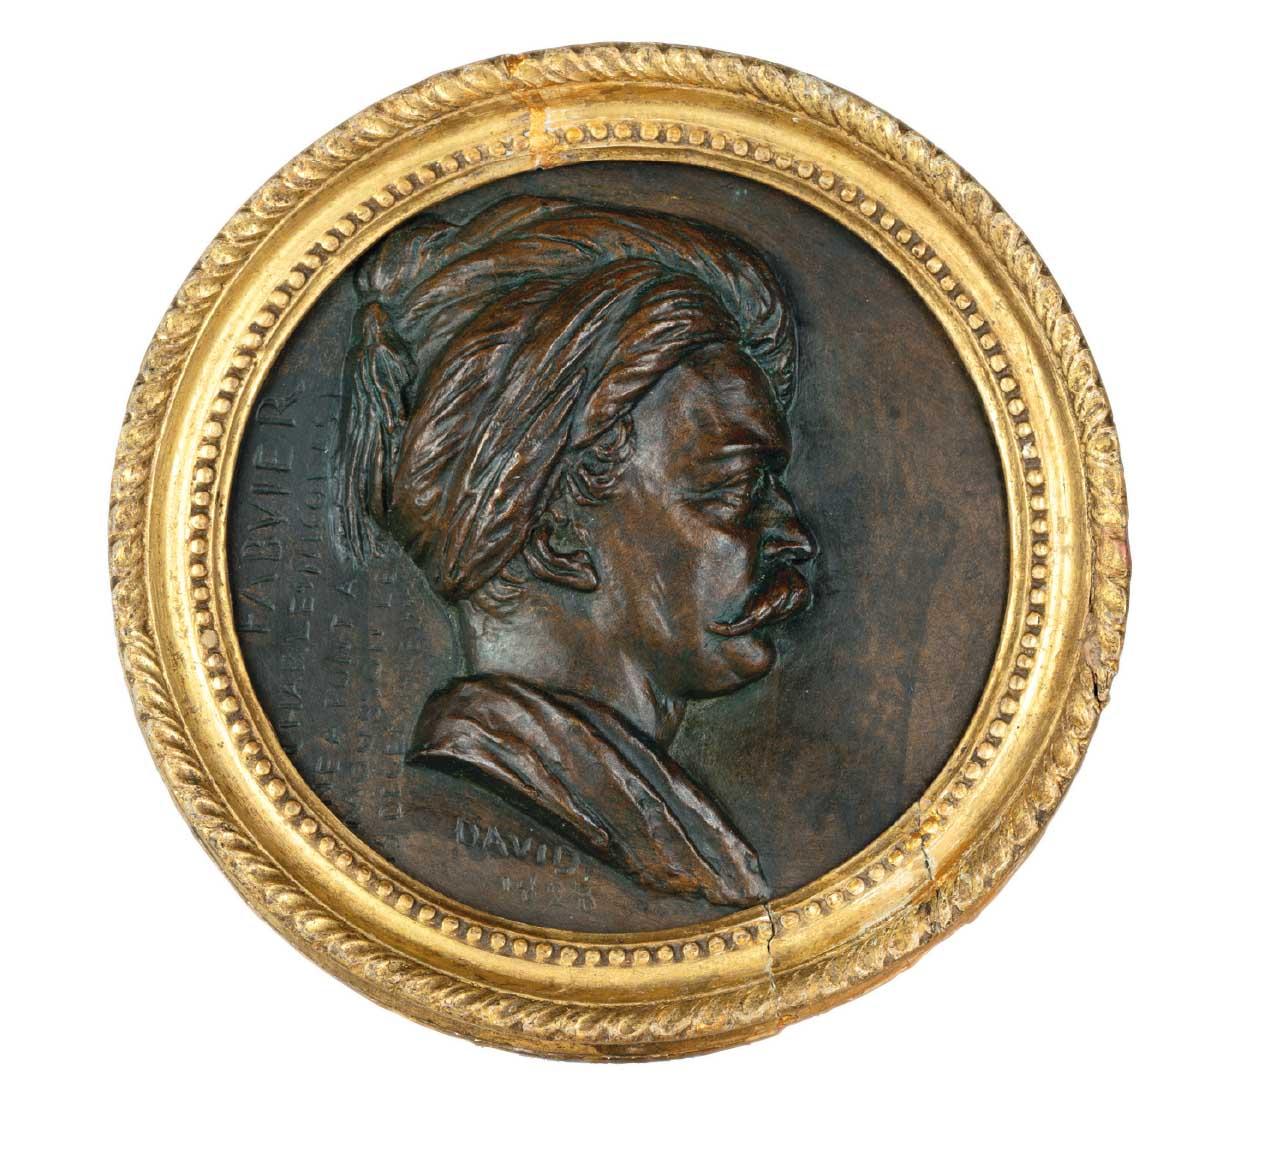 P. J. David d' Angers